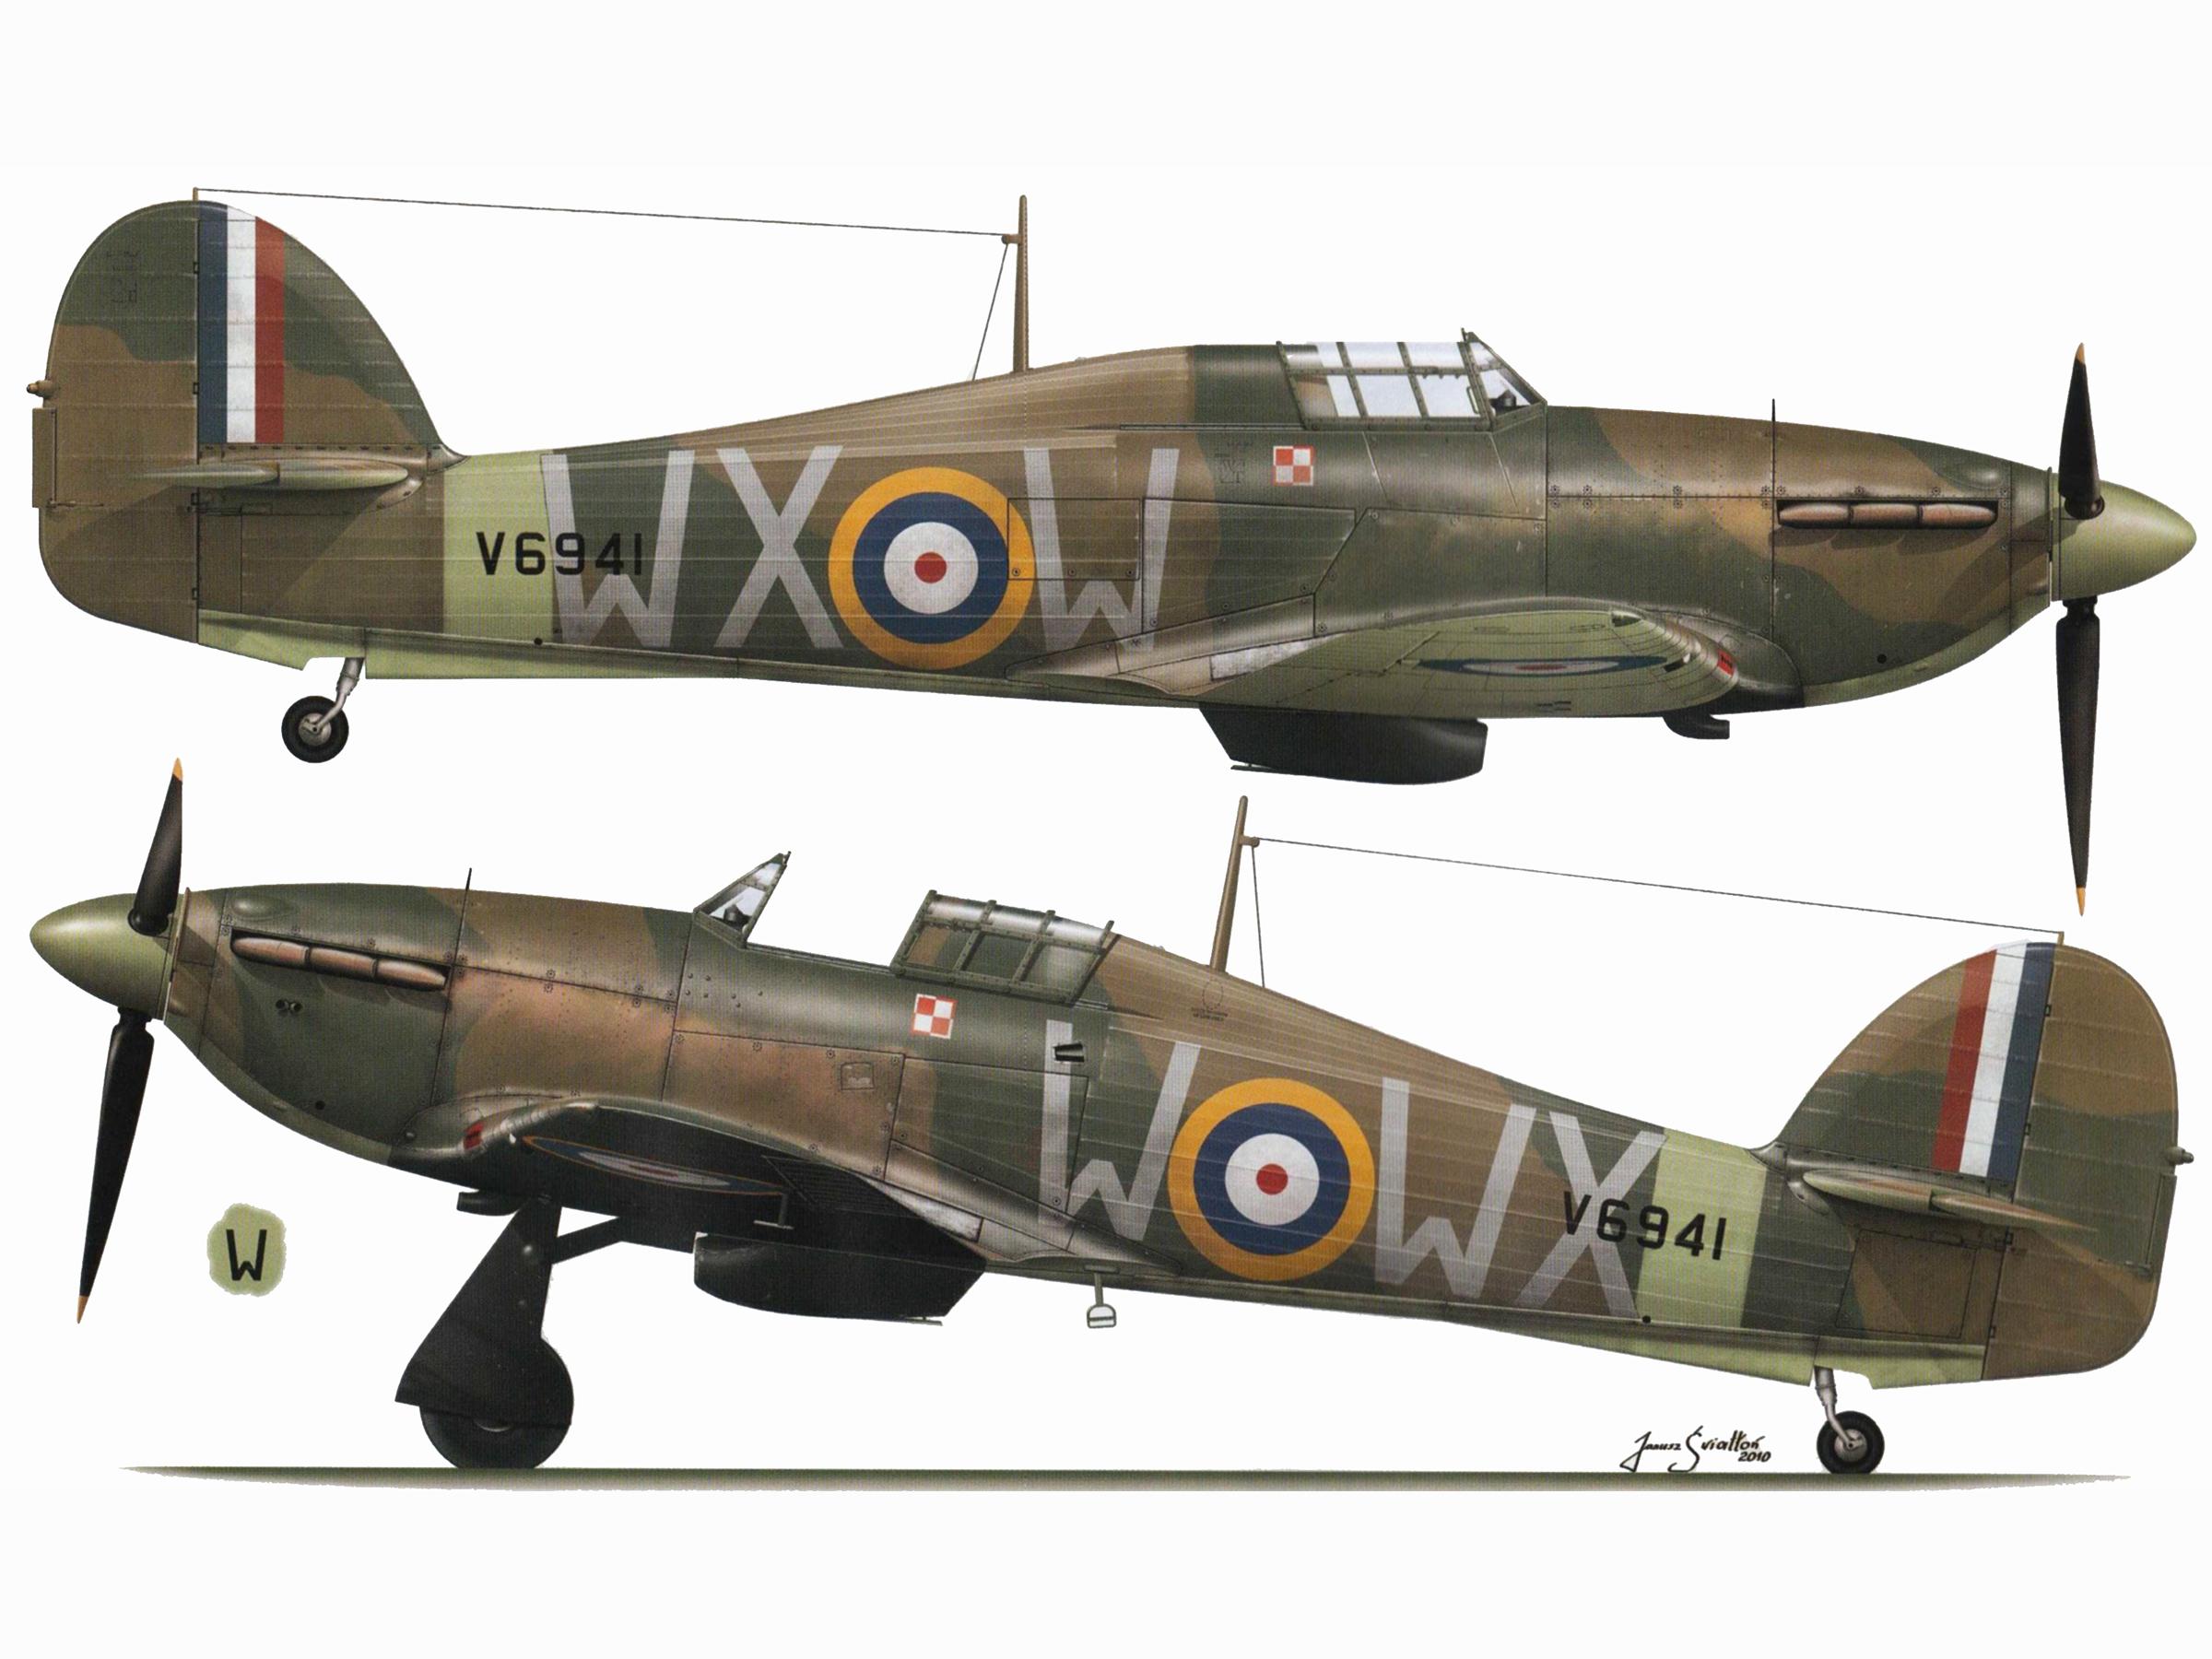 Hurricane I RAF 302Sqn WXW V6941 Duxford England Nov 1940 TC15016